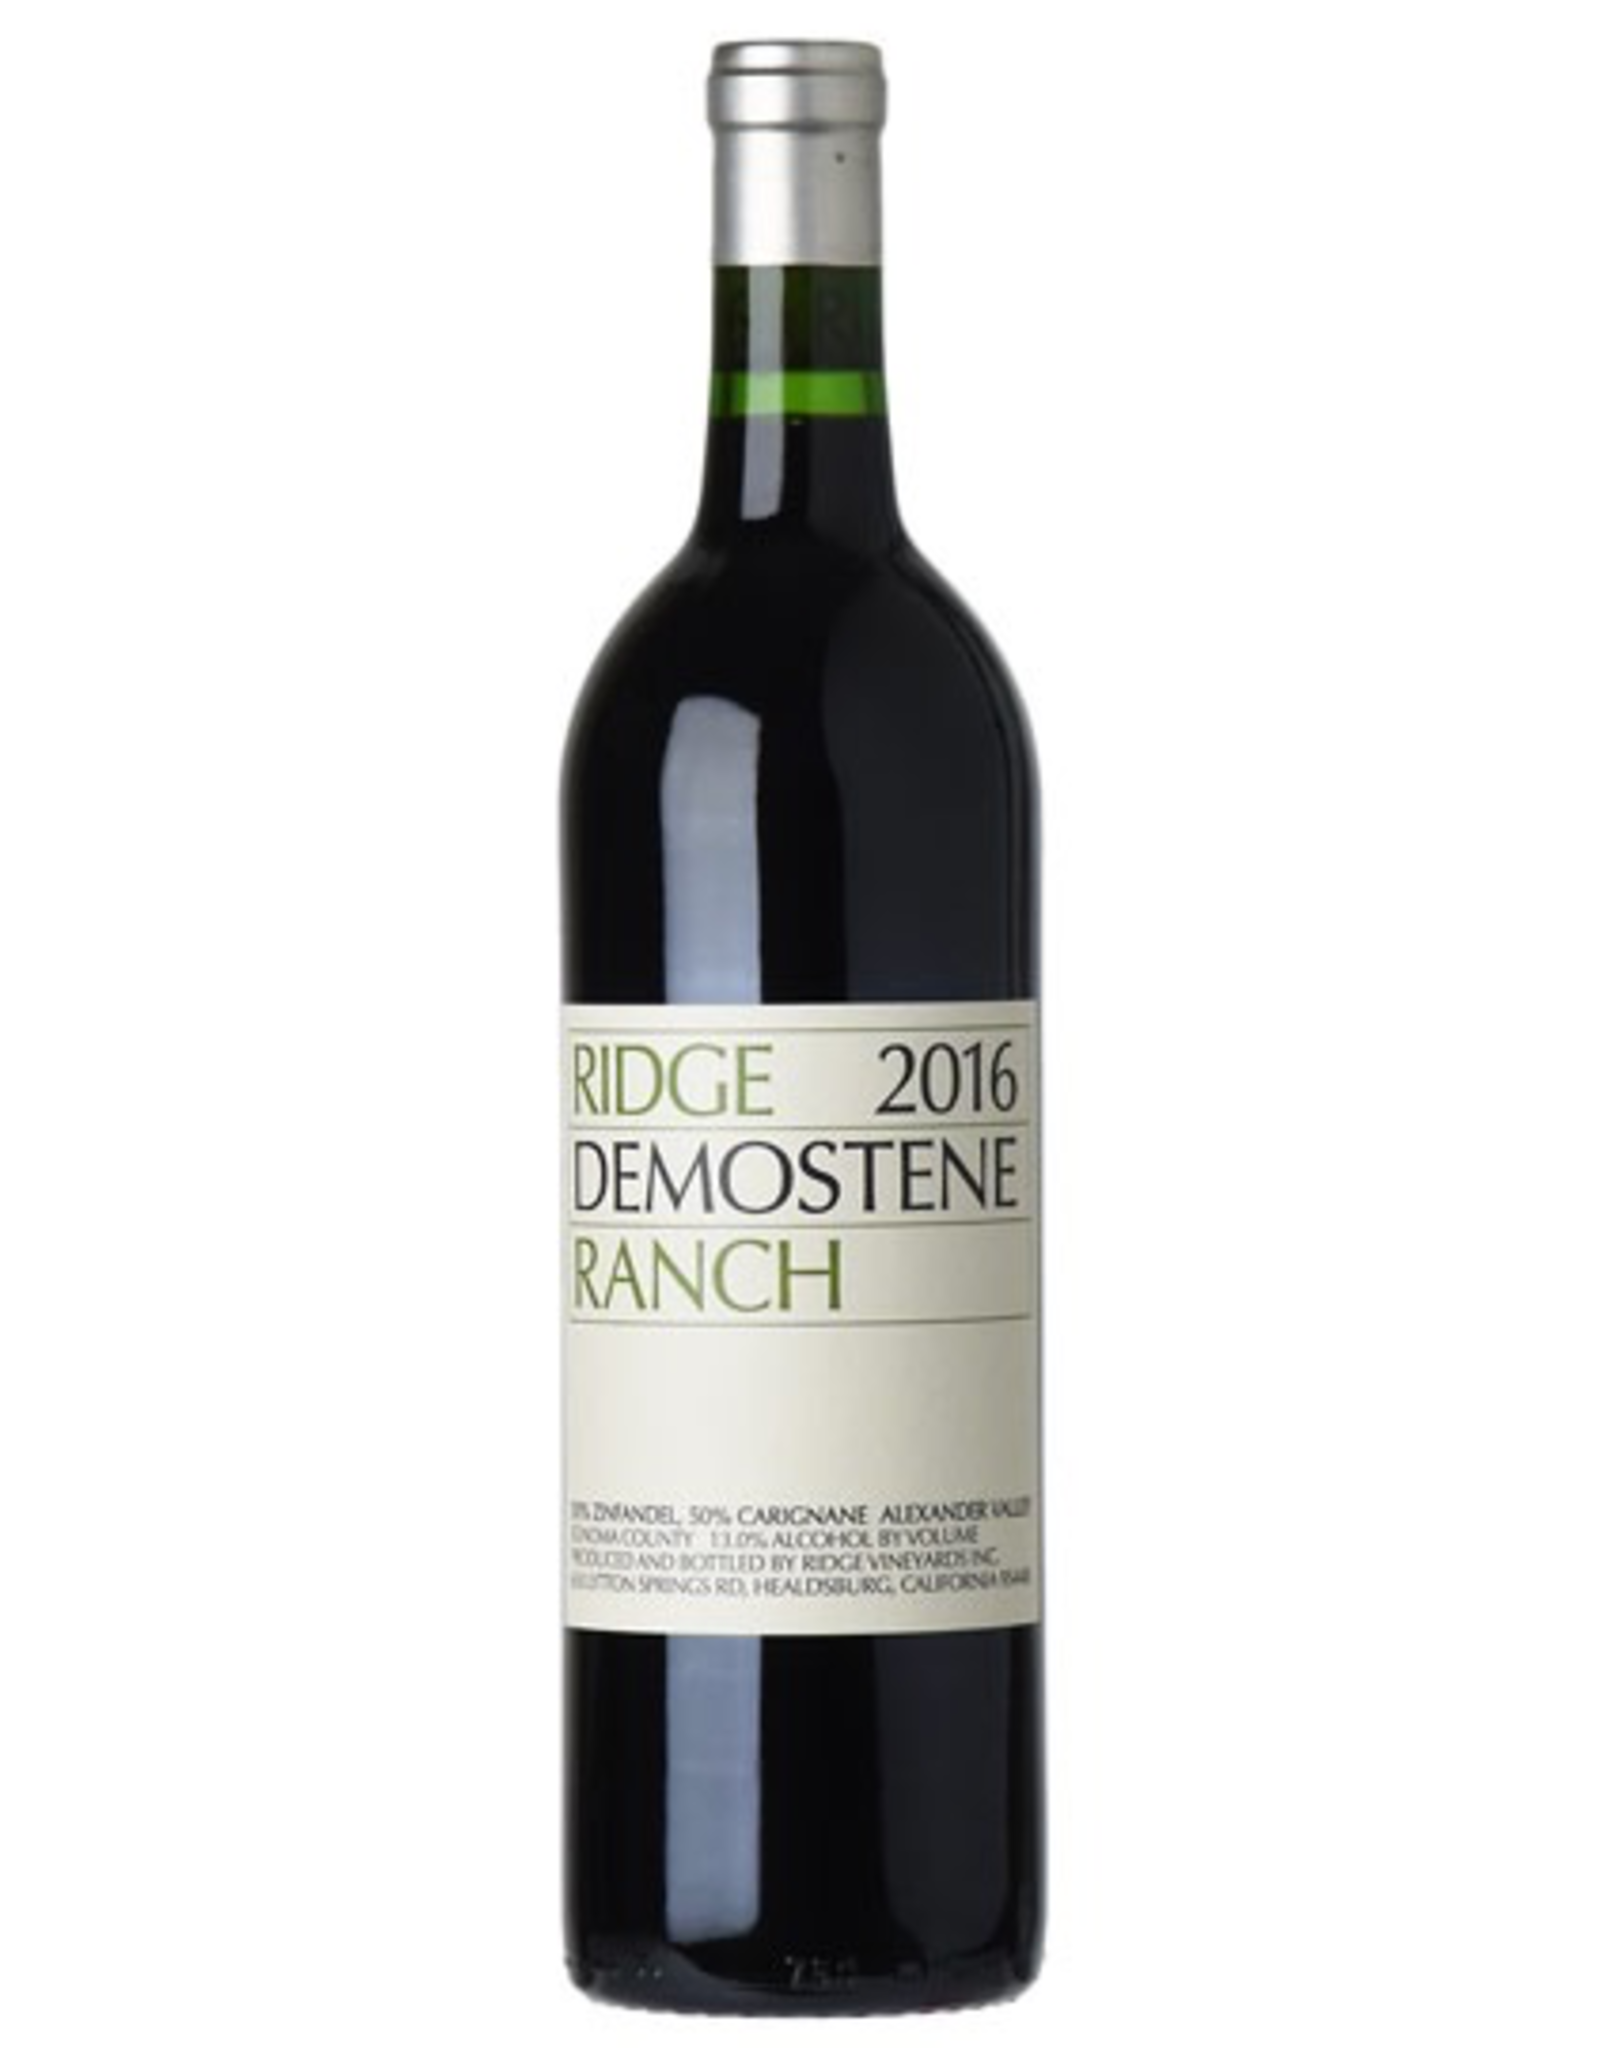 Red Wine 2016, Ridge Demostene Ranch <br /> (95 Year Old Vines), 50% Carignana 50% Zinfandel, Alexander Valley, Sonoma County, California, 13% Alc, TW94